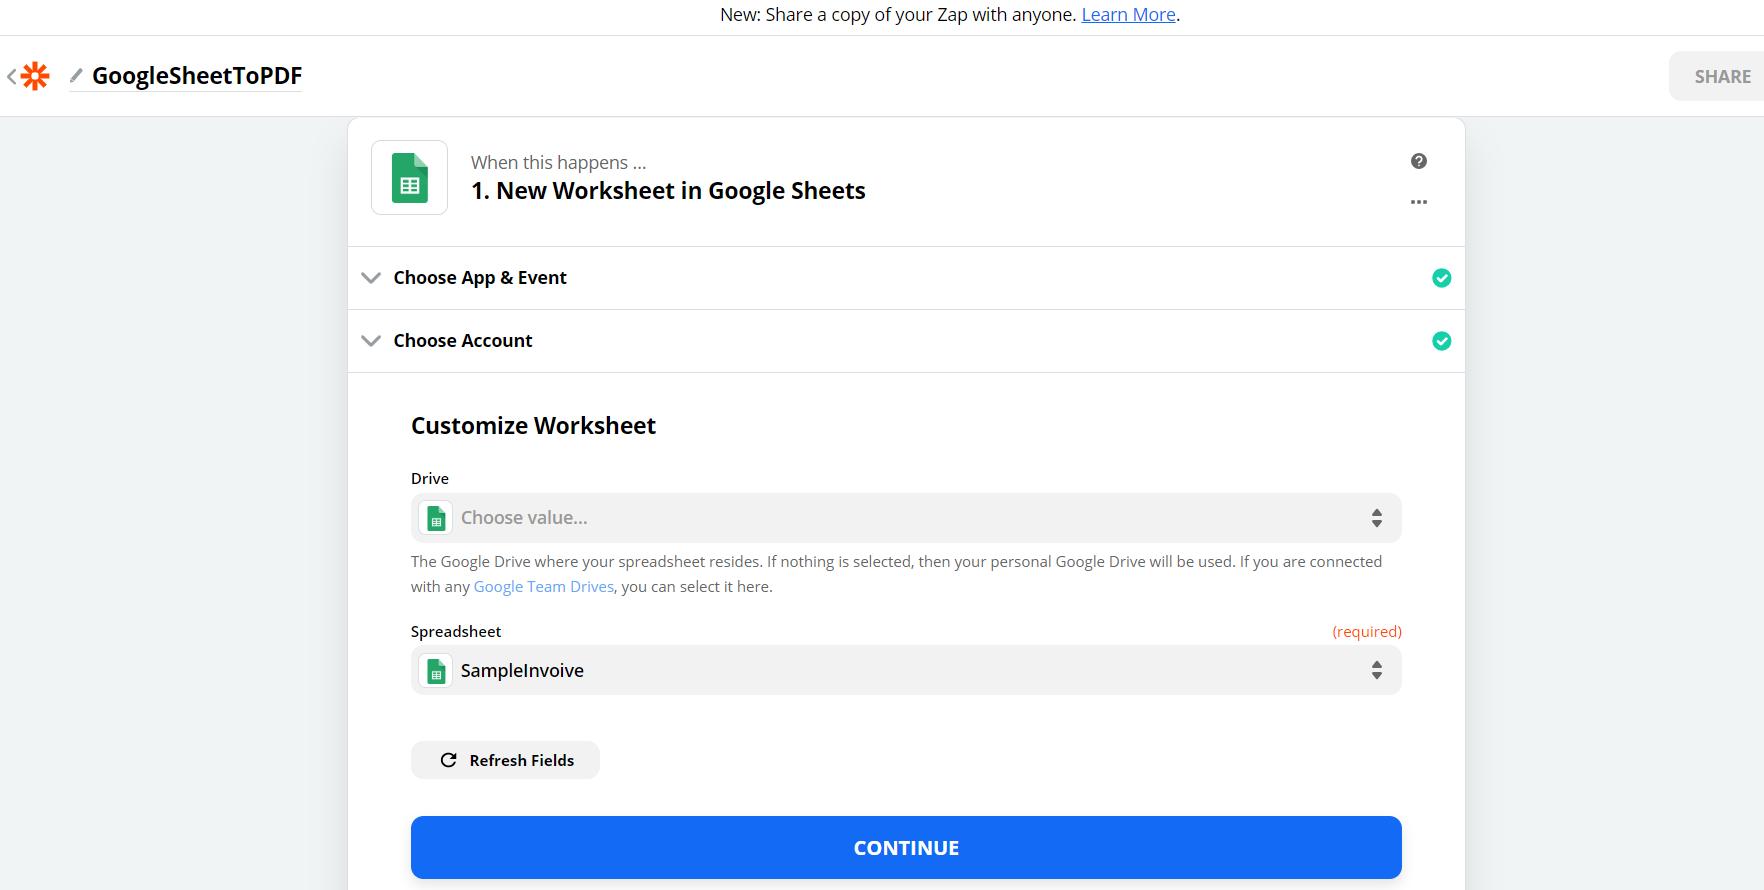 Specify Google Sheet